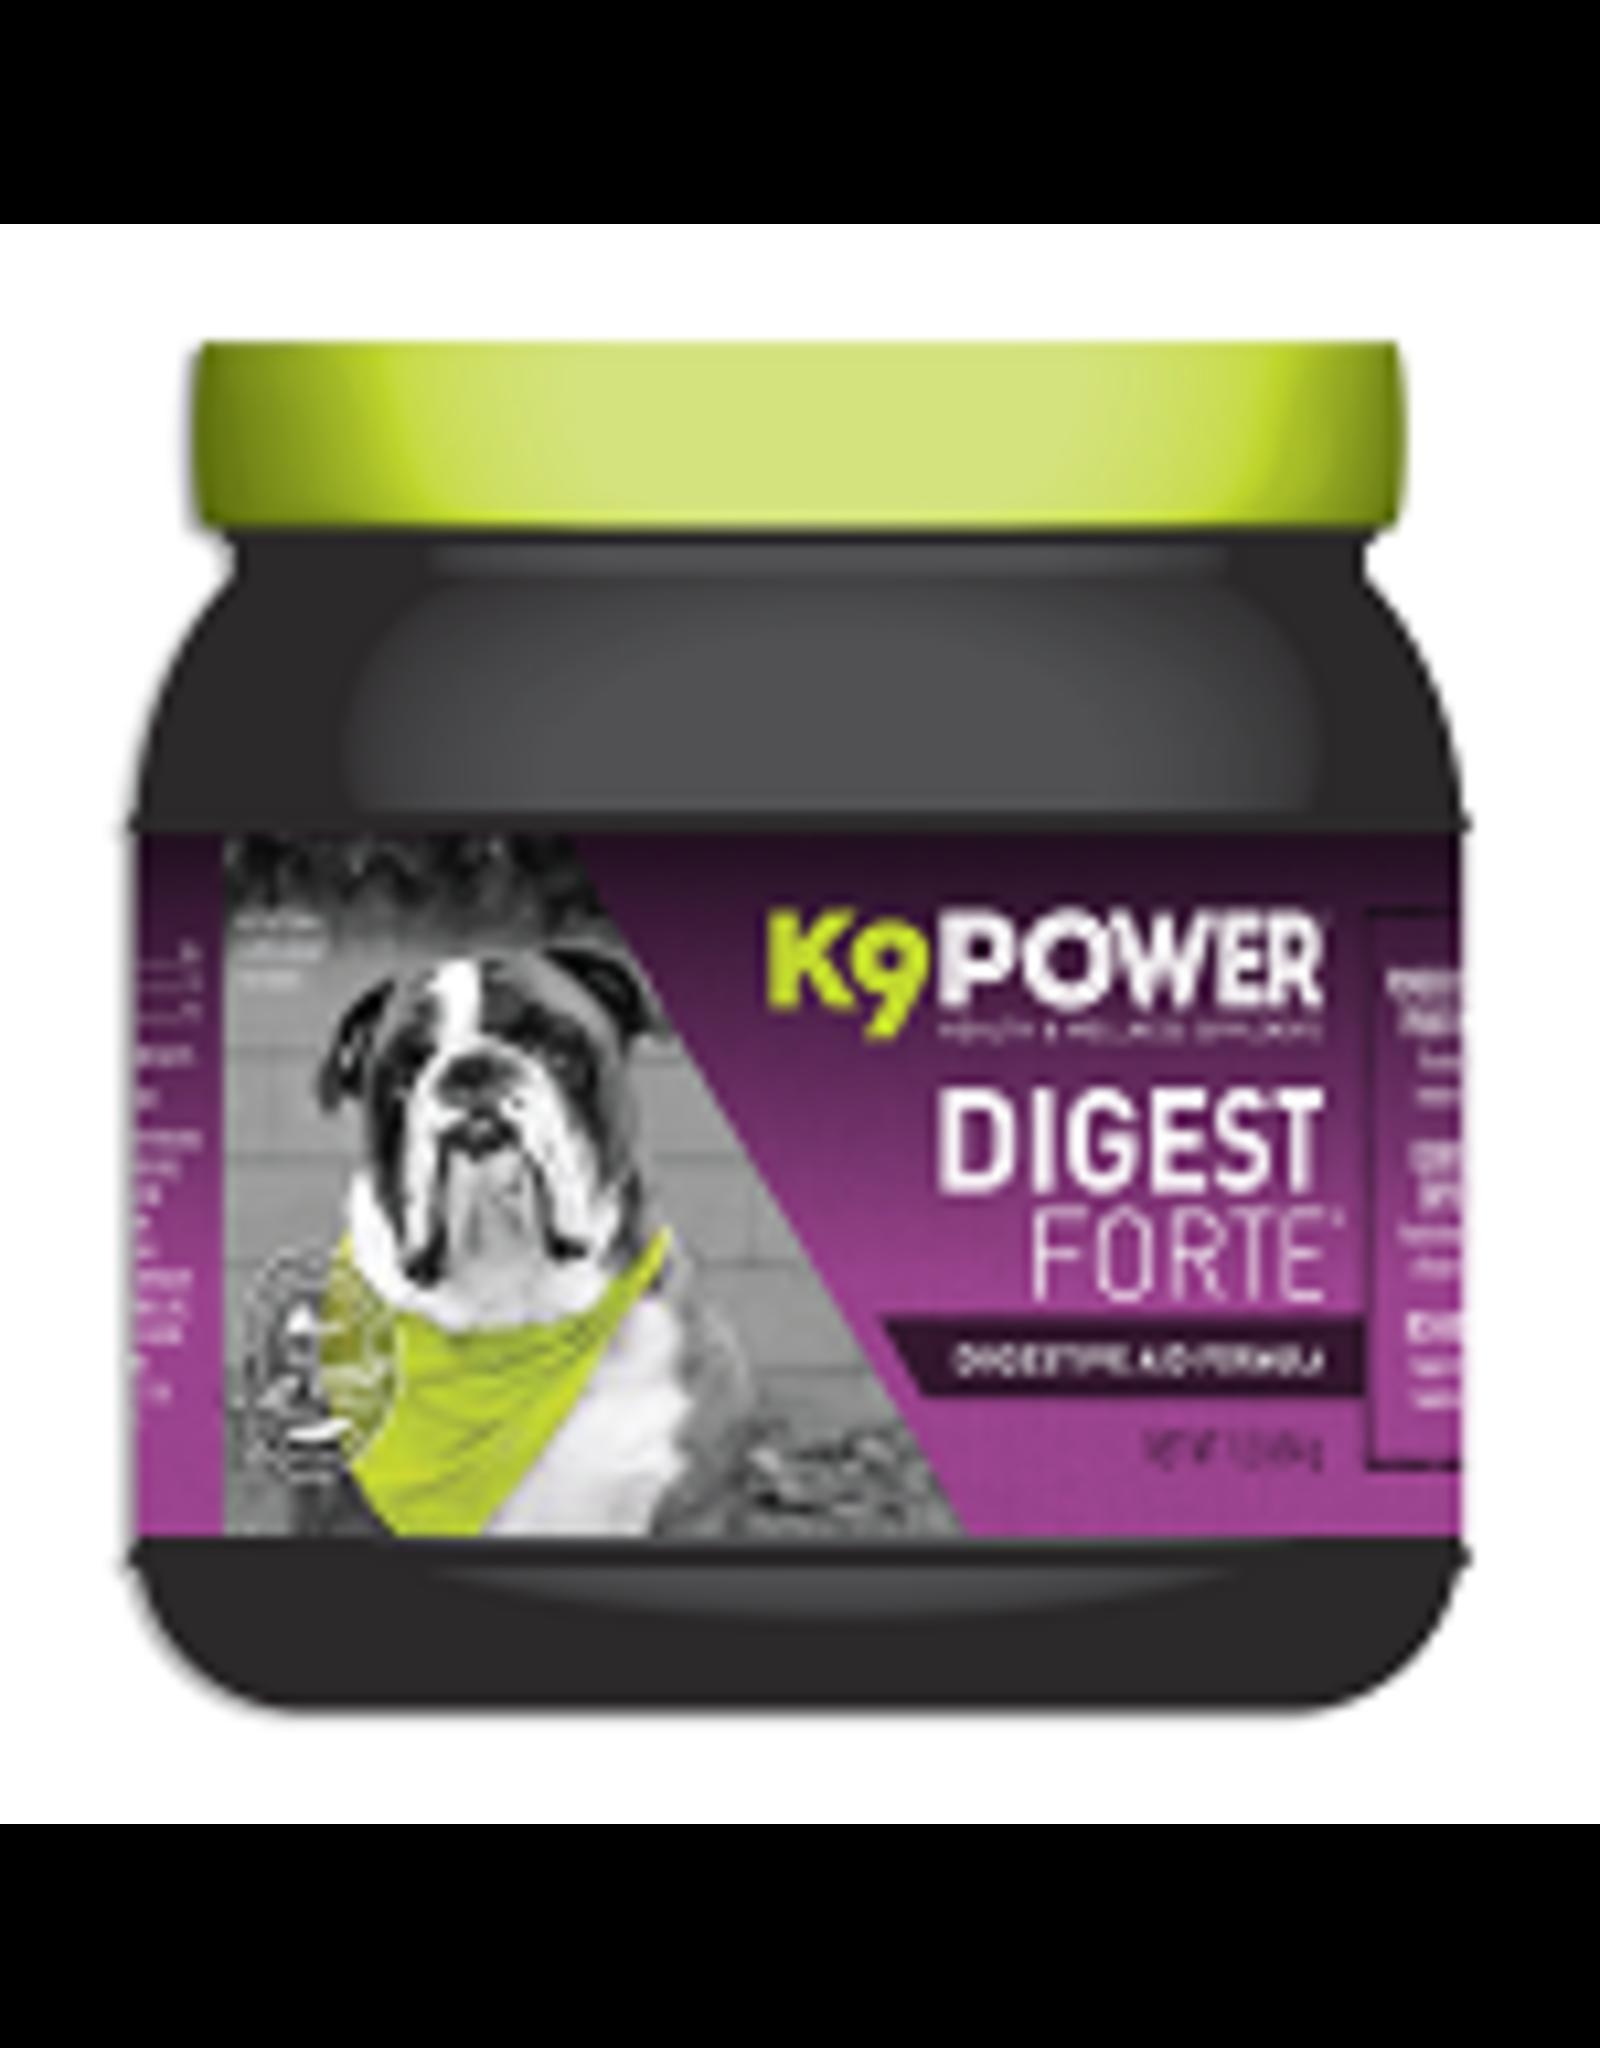 K9 Power K9 POWER Digest Forte 1#